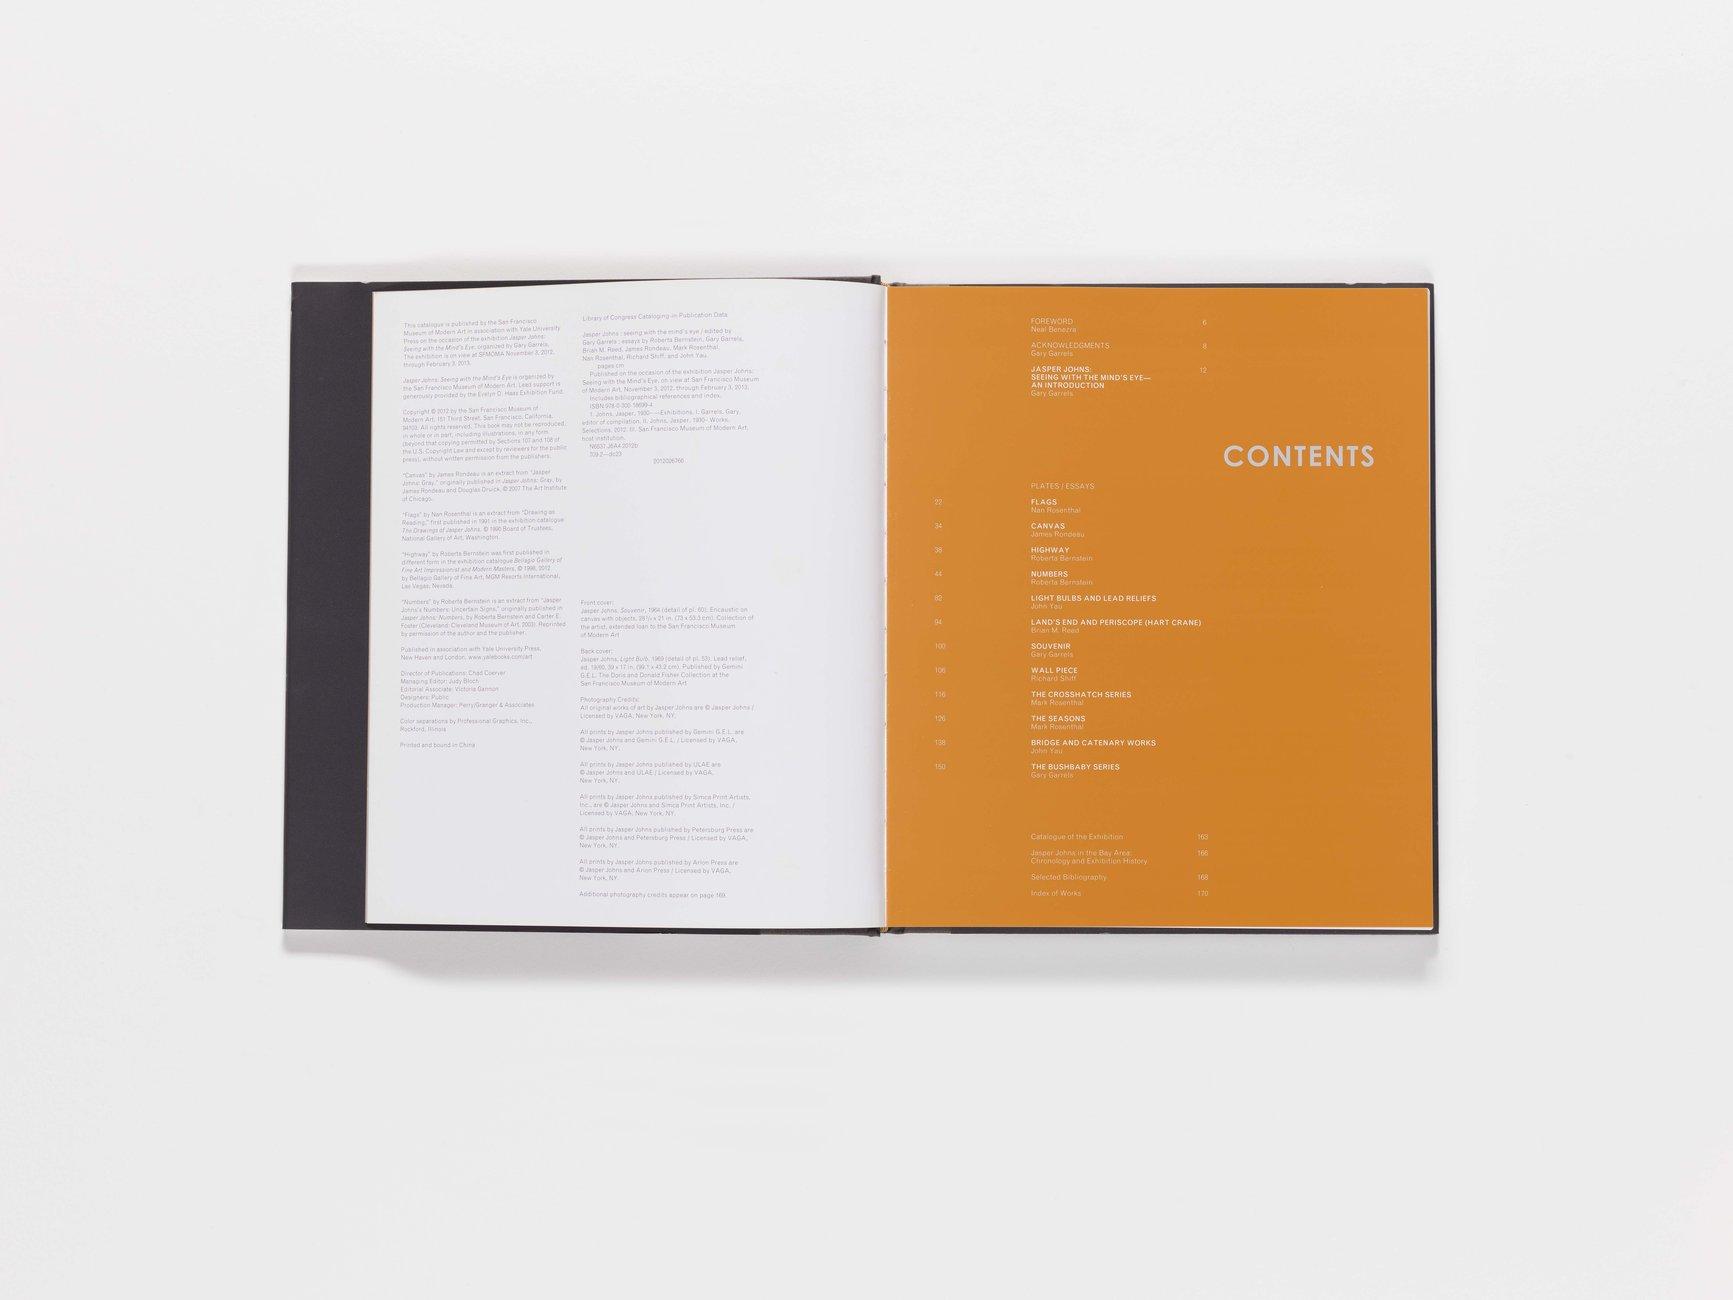 Jasper Johns publication table of contents